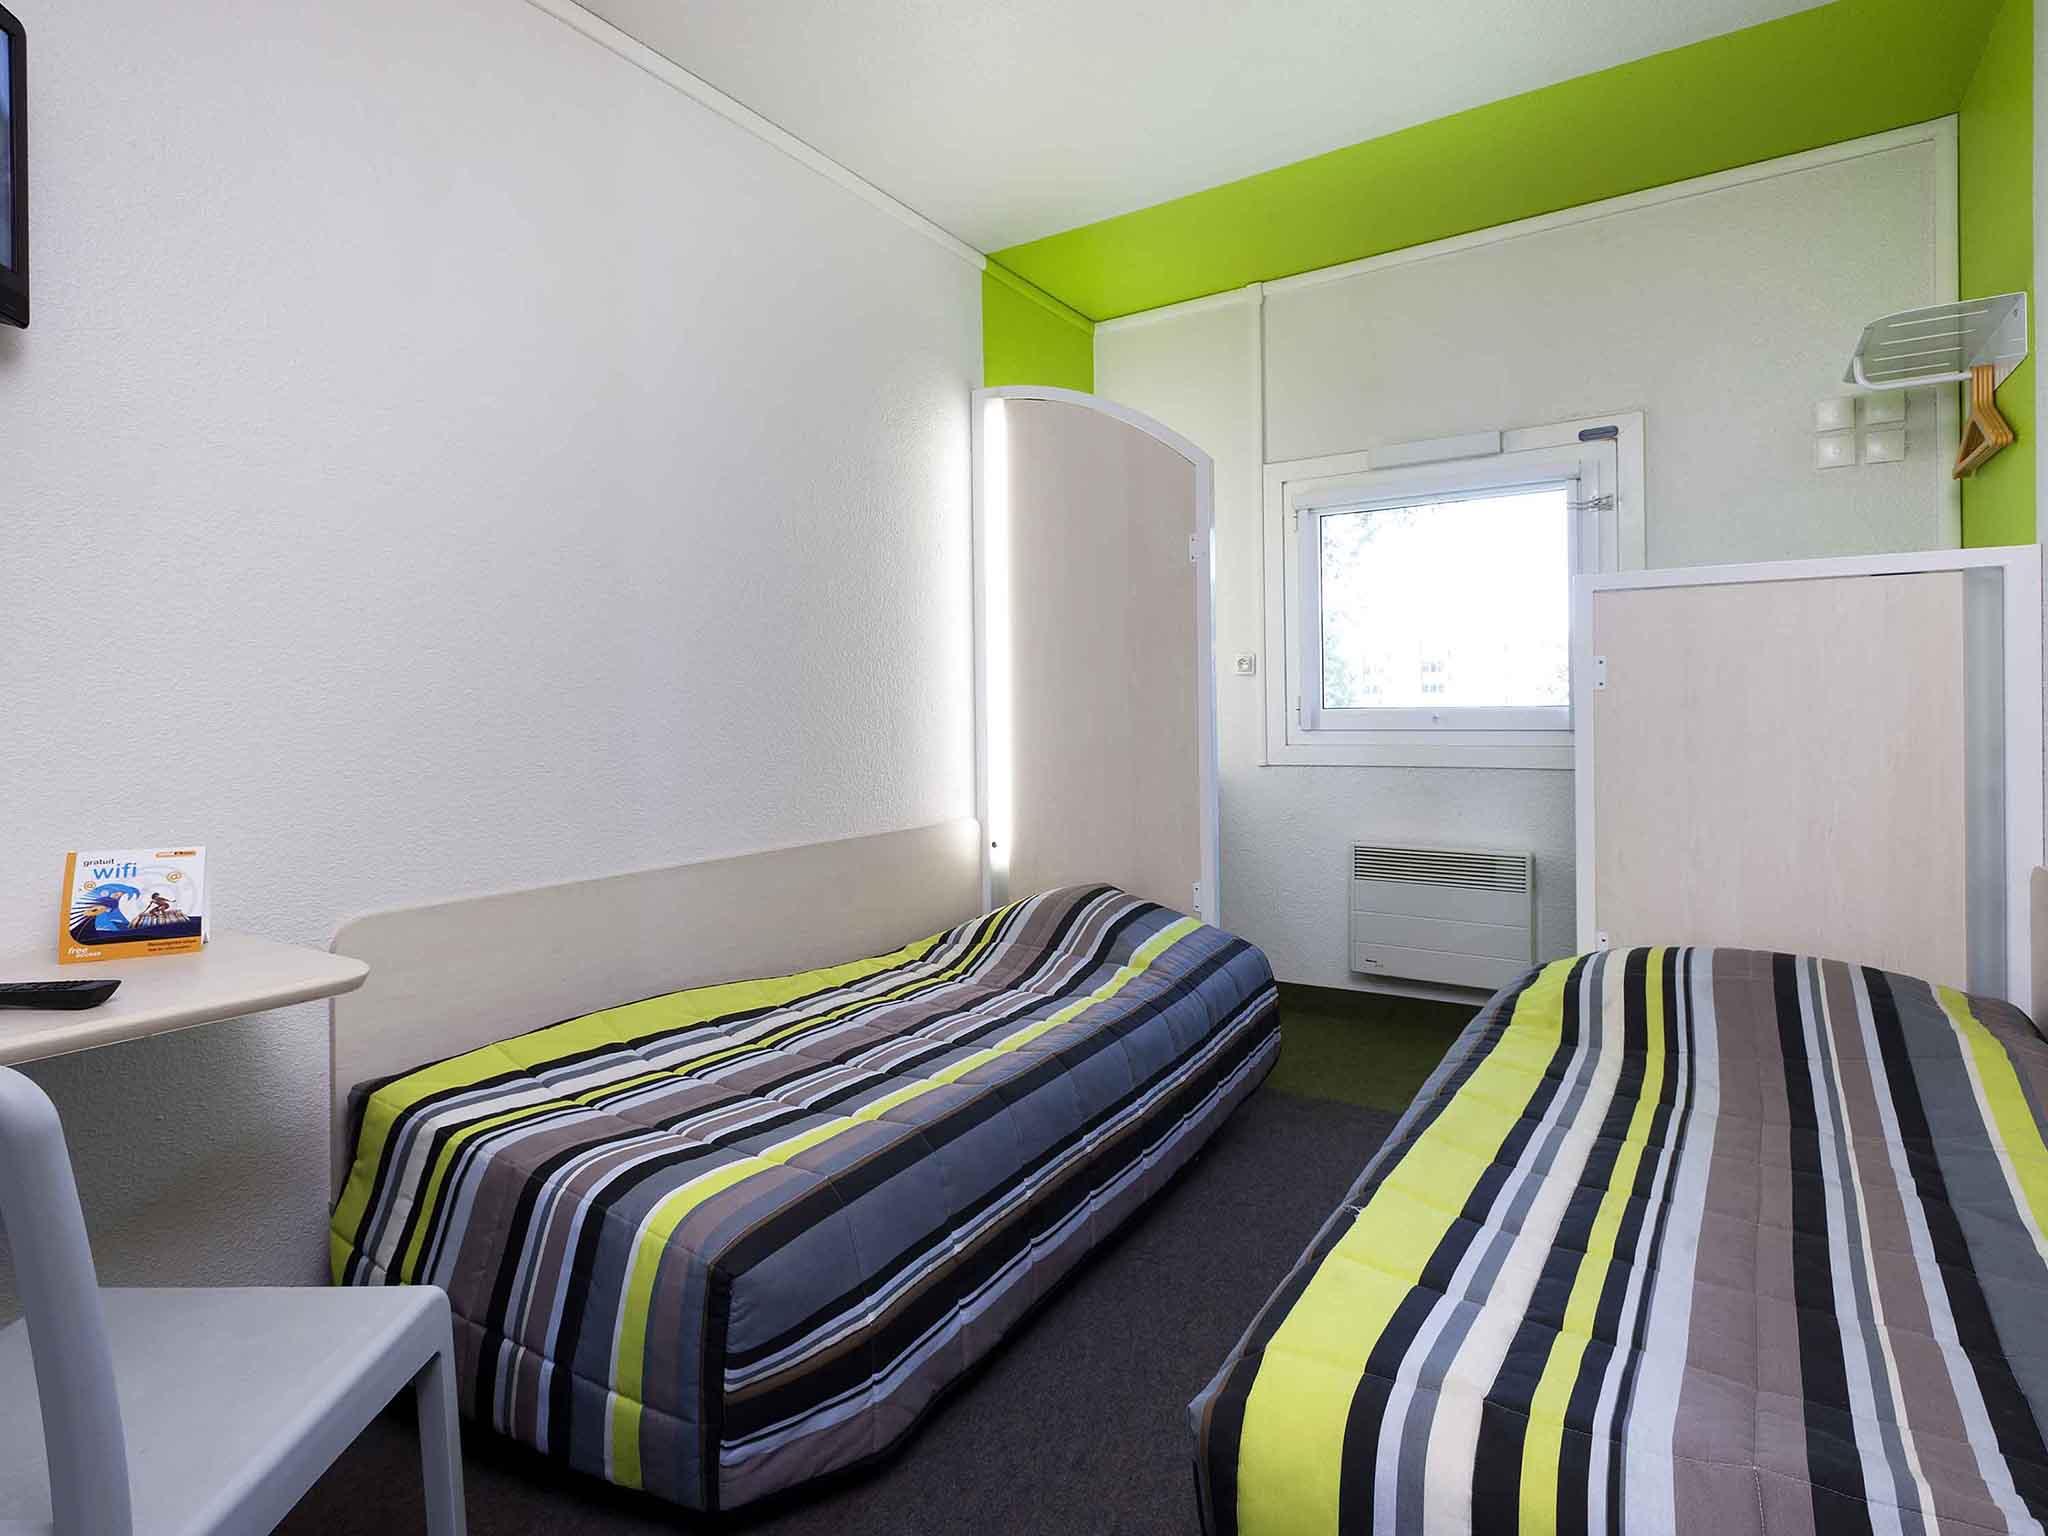 Отель — hotelF1 Boulogne-sur-Mer